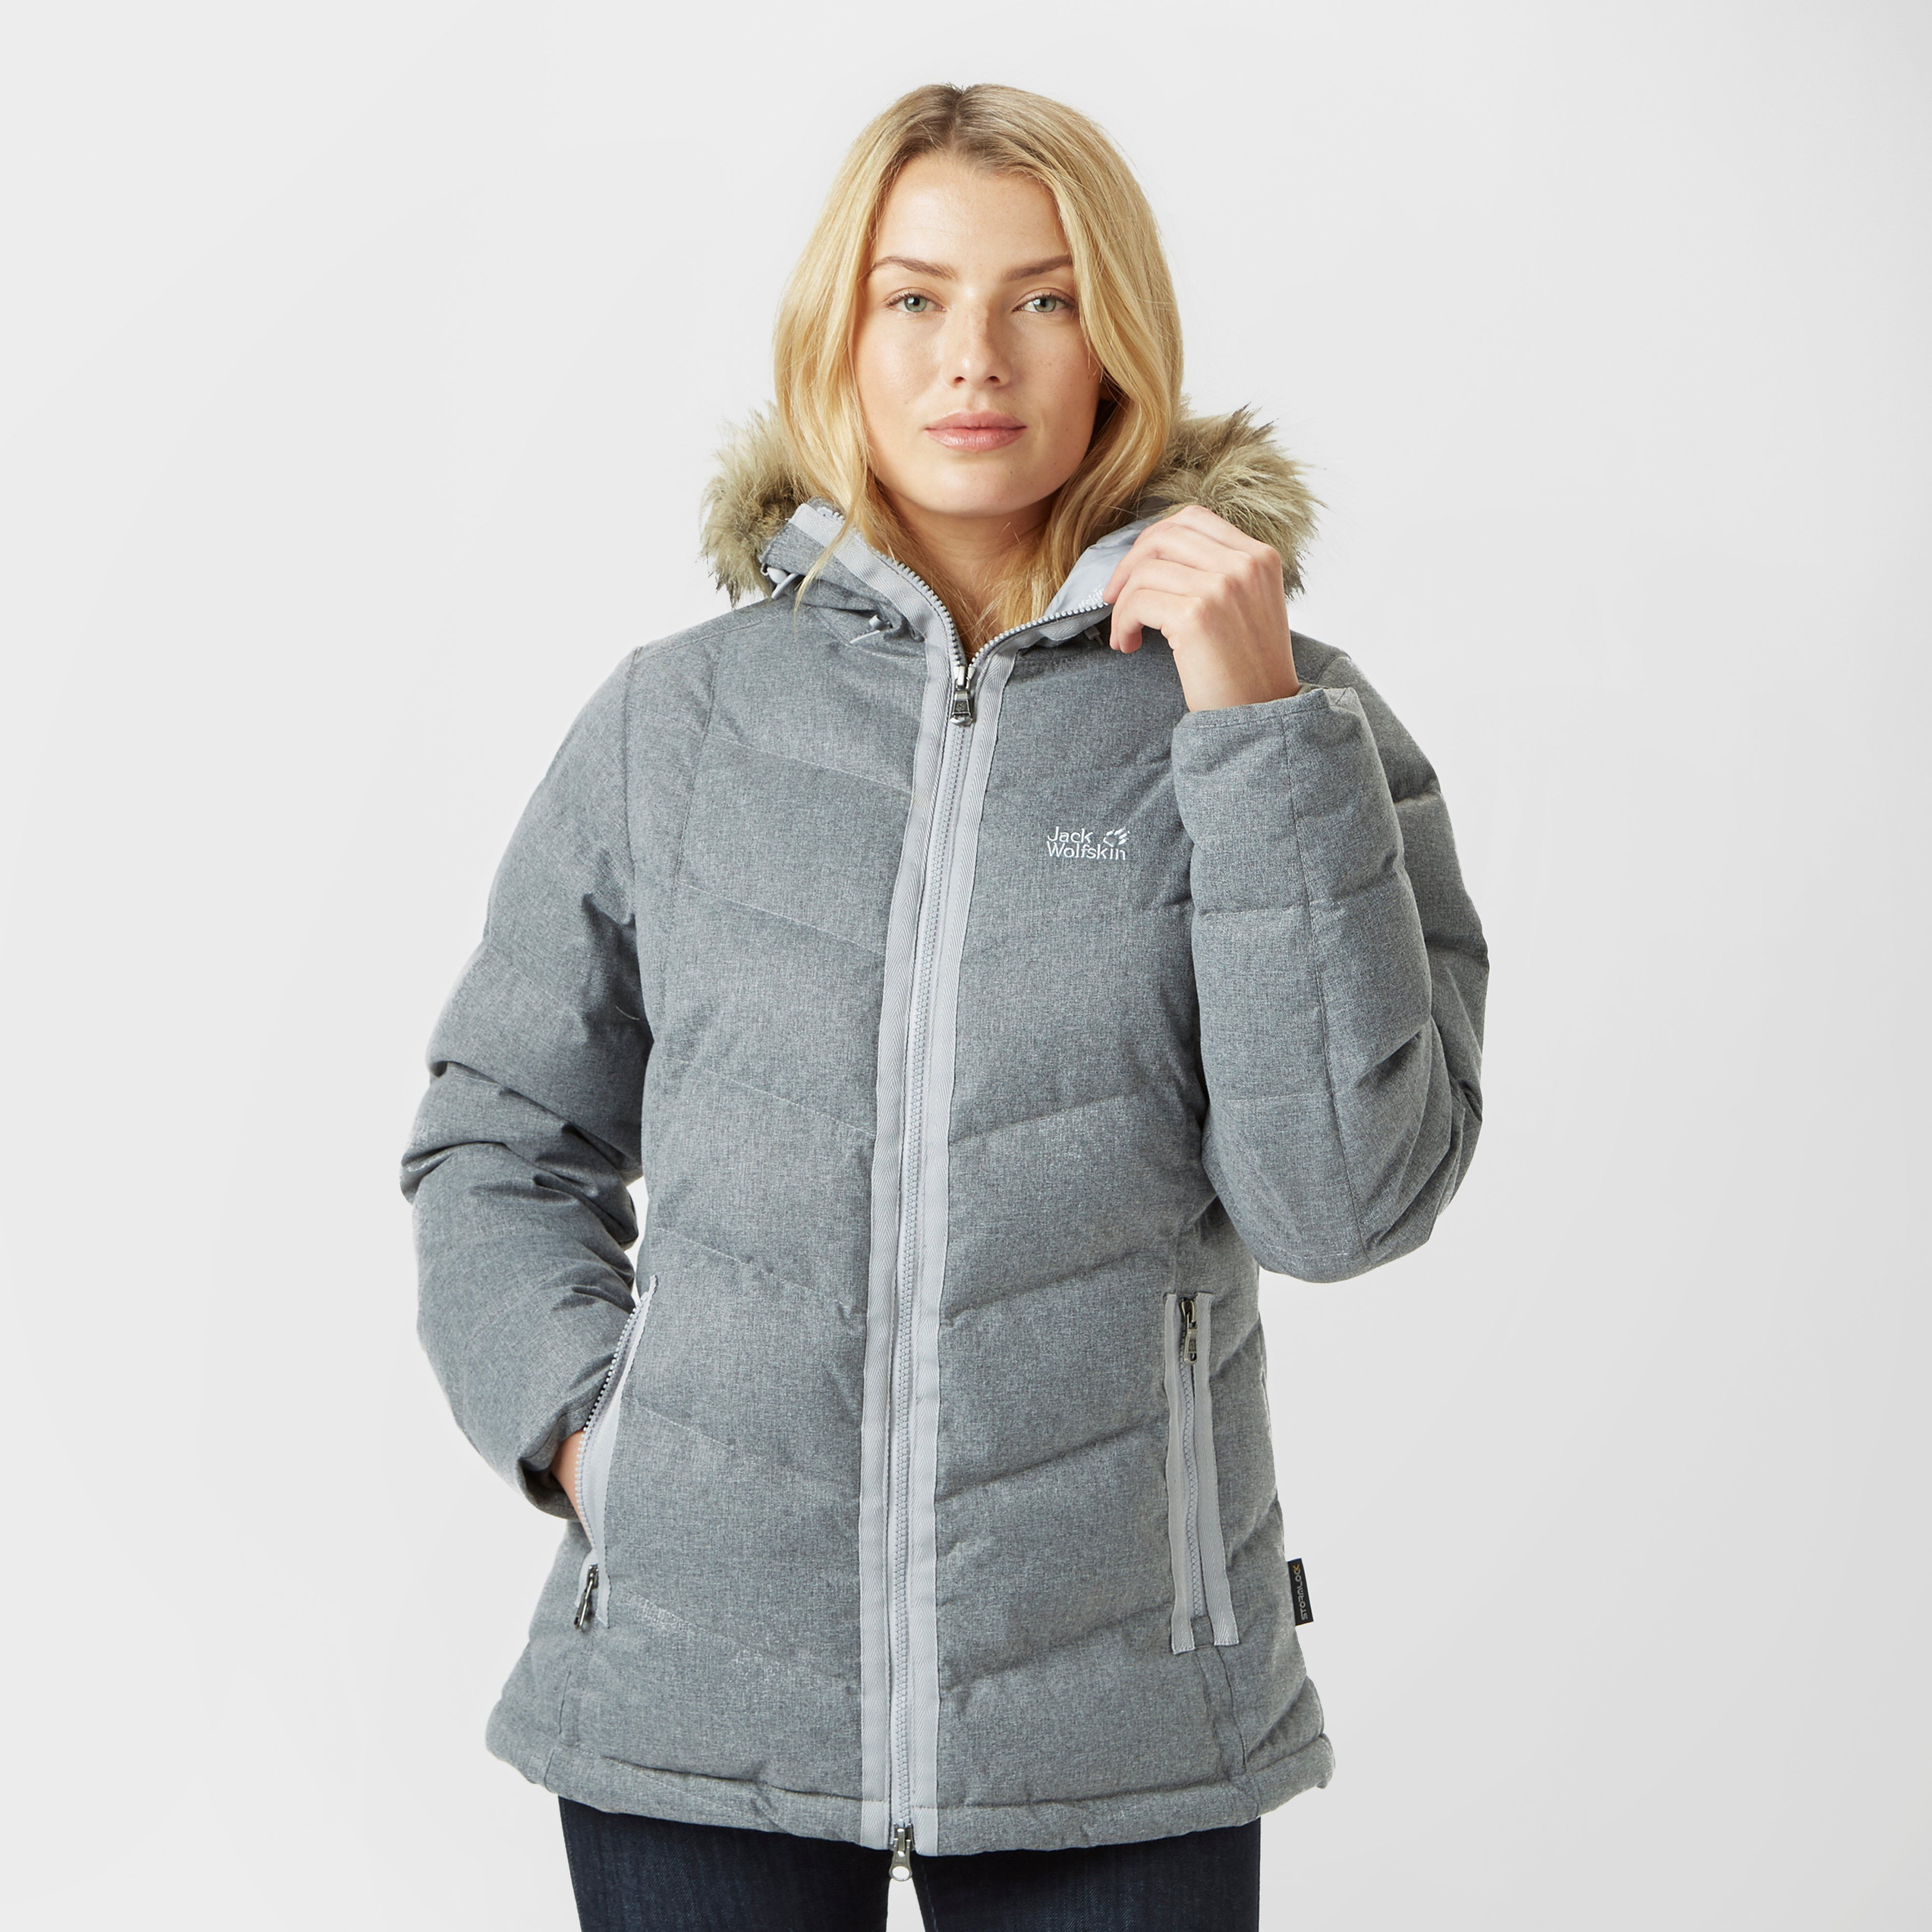 JACK WOLFSKIN Women's Baffin Bay Jacket